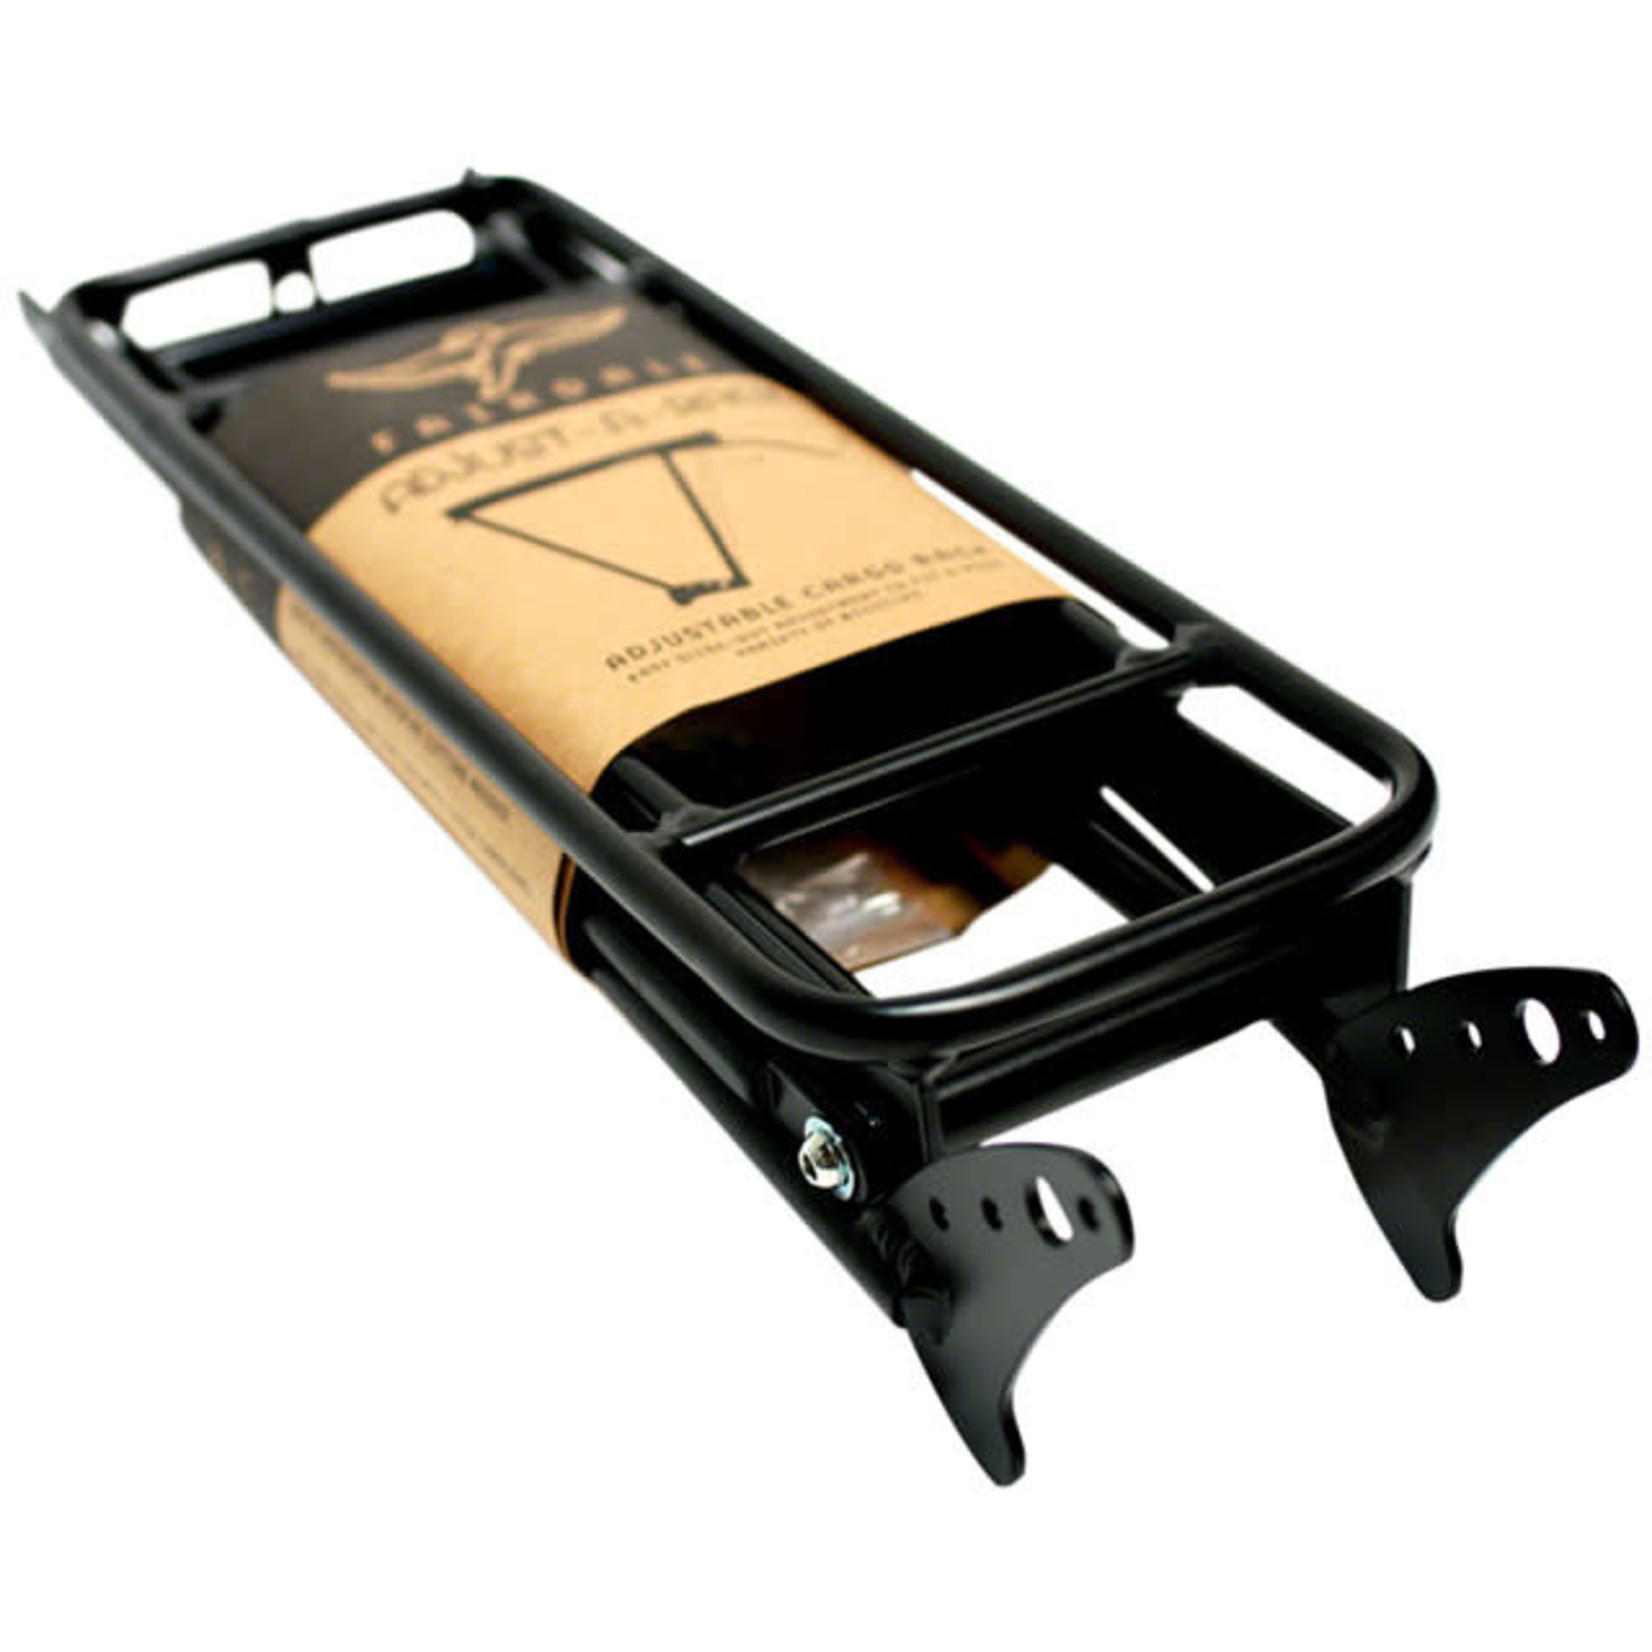 Fairdale Adjust-a-rack Cargo Rack Black